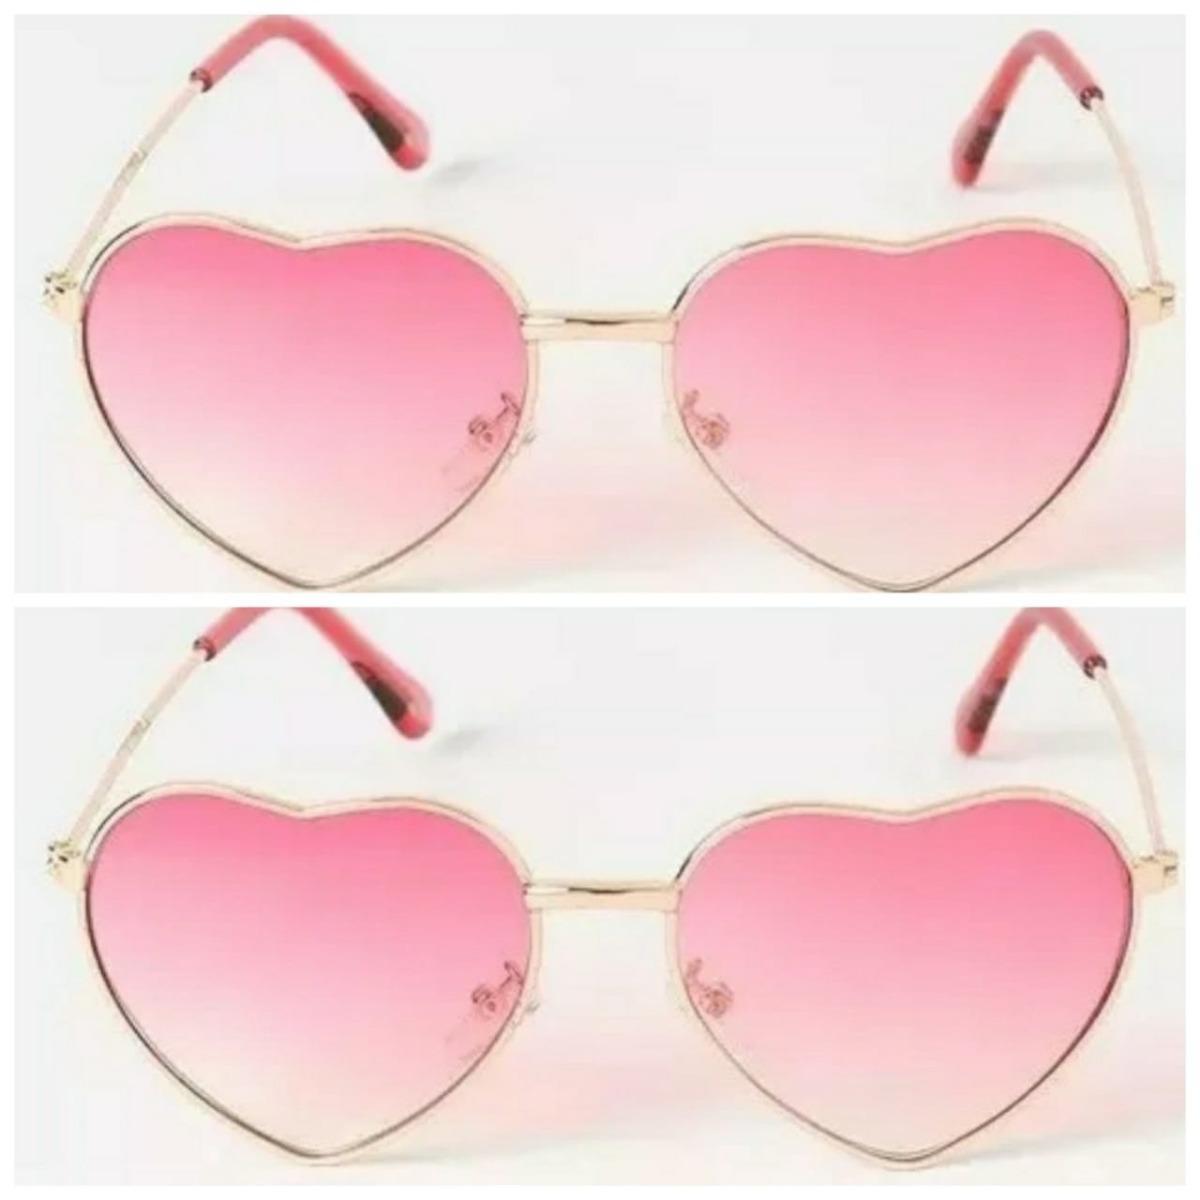 1d52a6d5c óculos degradê lente rosa menina infantil moda kids praia. Carregando zoom.